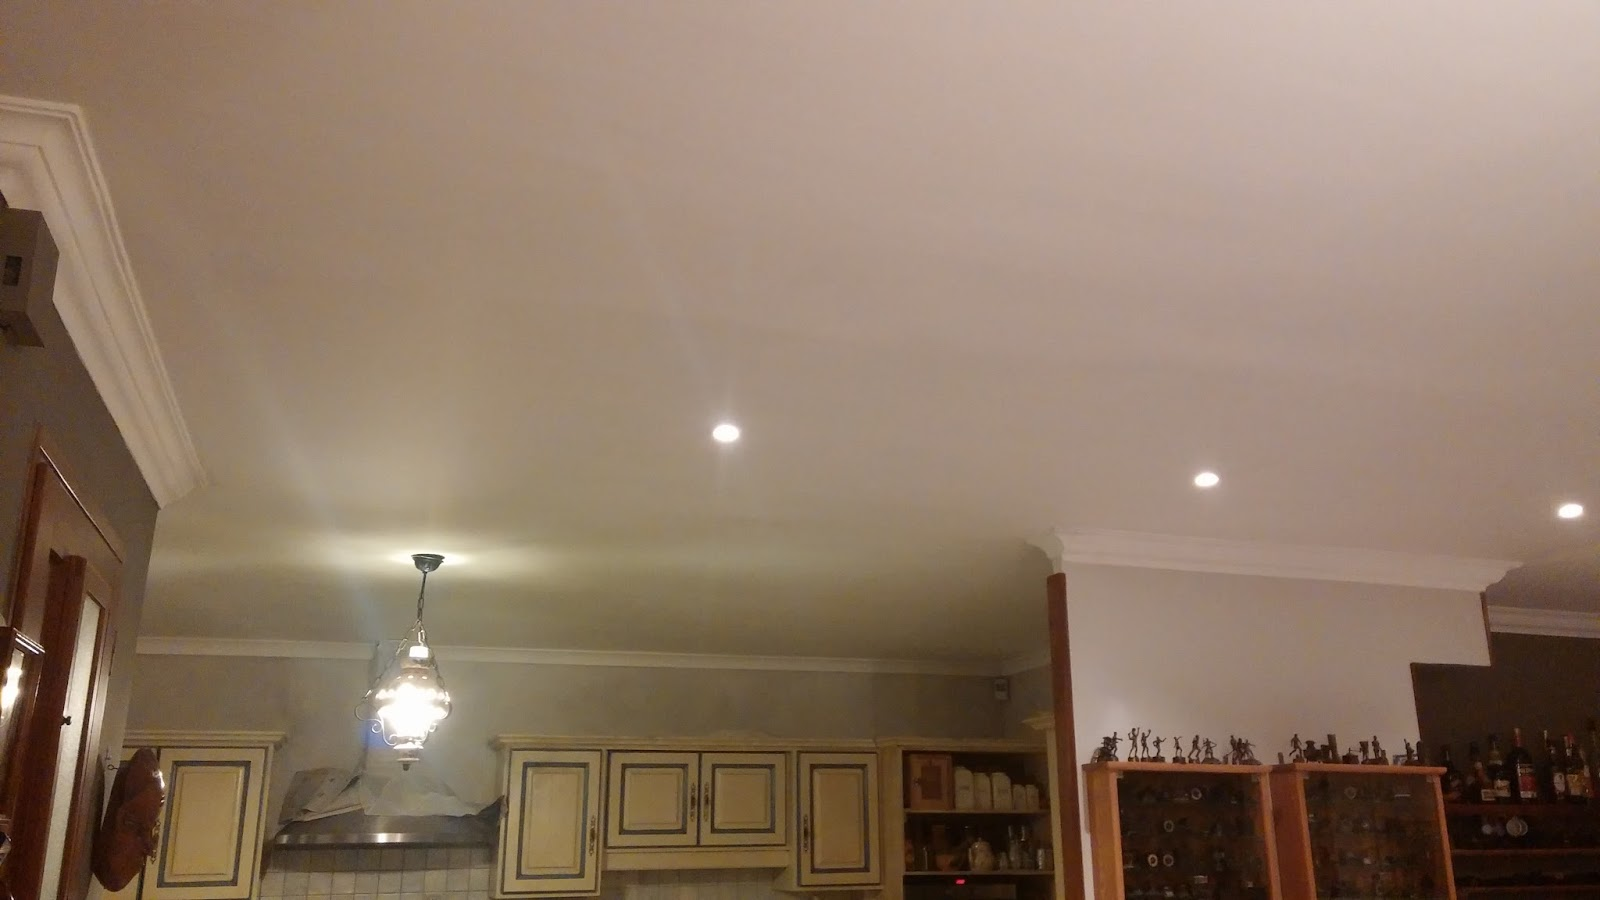 sf peinture renov plafond noirci par la fum e. Black Bedroom Furniture Sets. Home Design Ideas